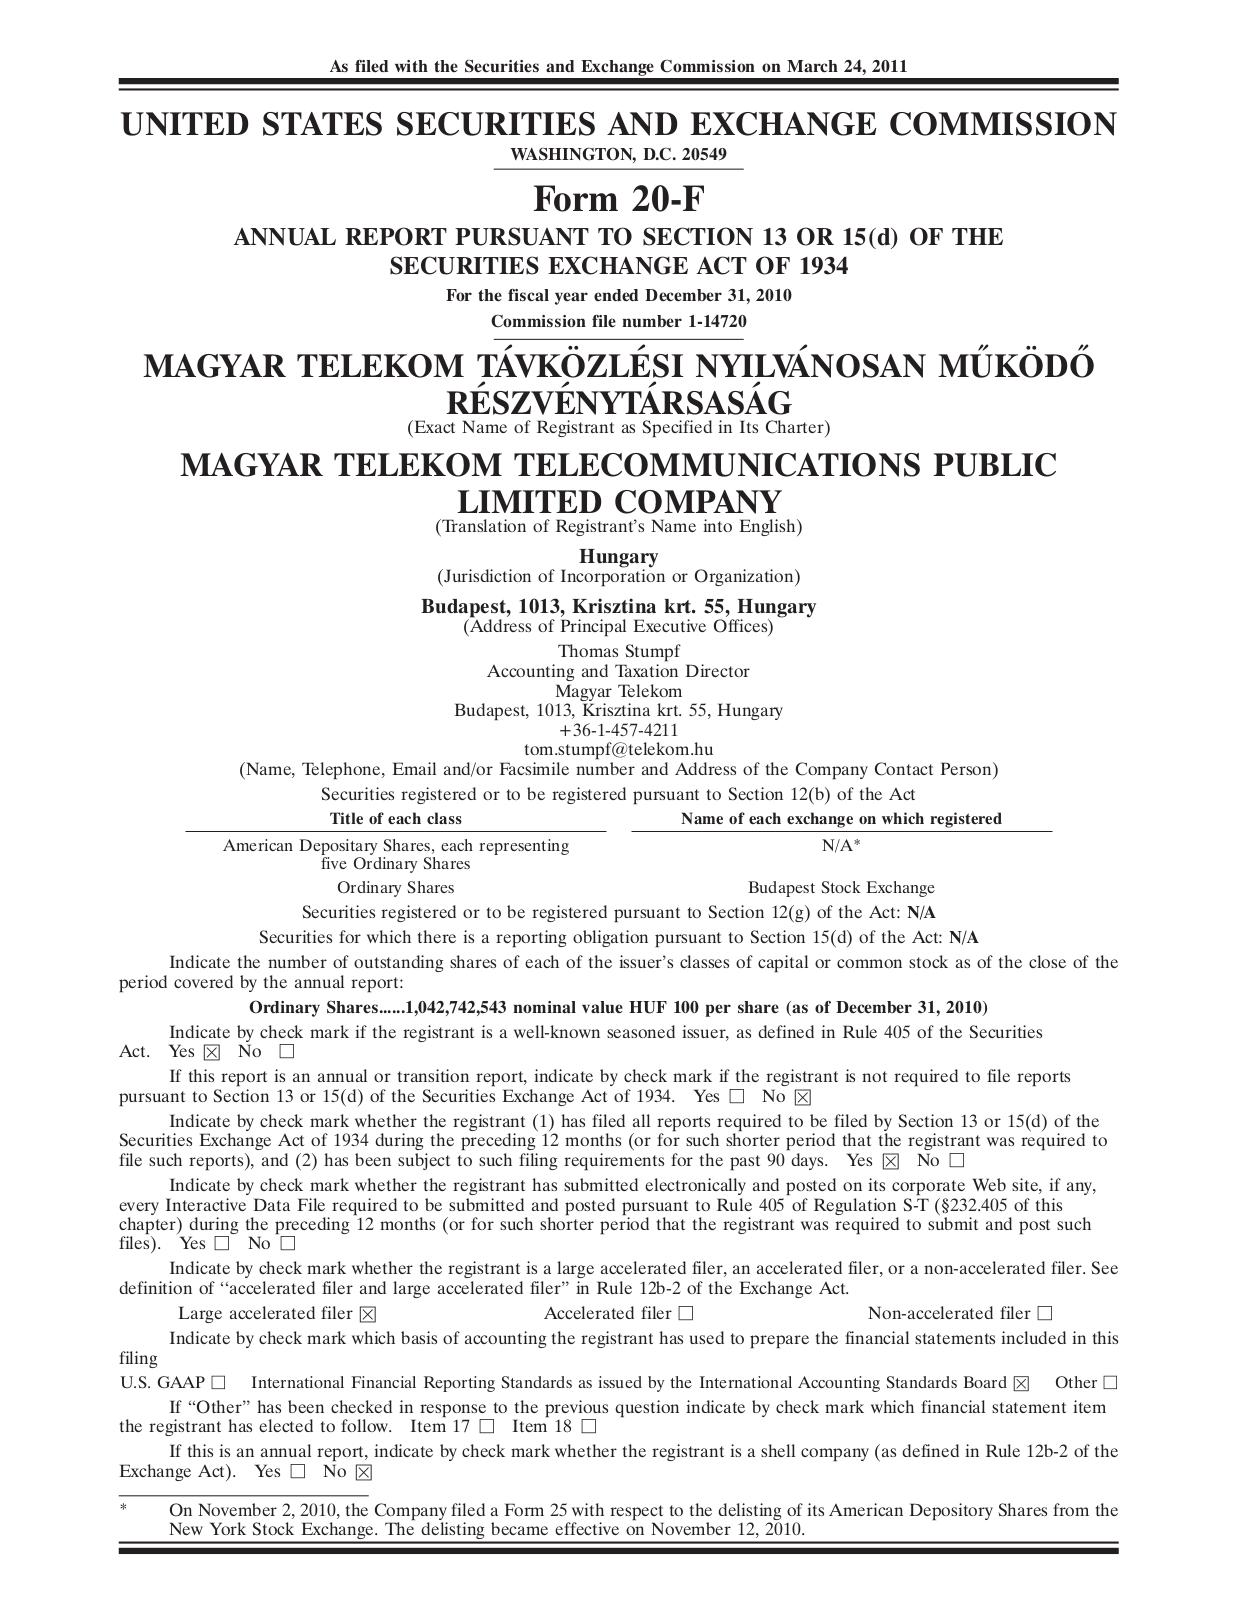 pdf for Navigon GPS 2120 manual